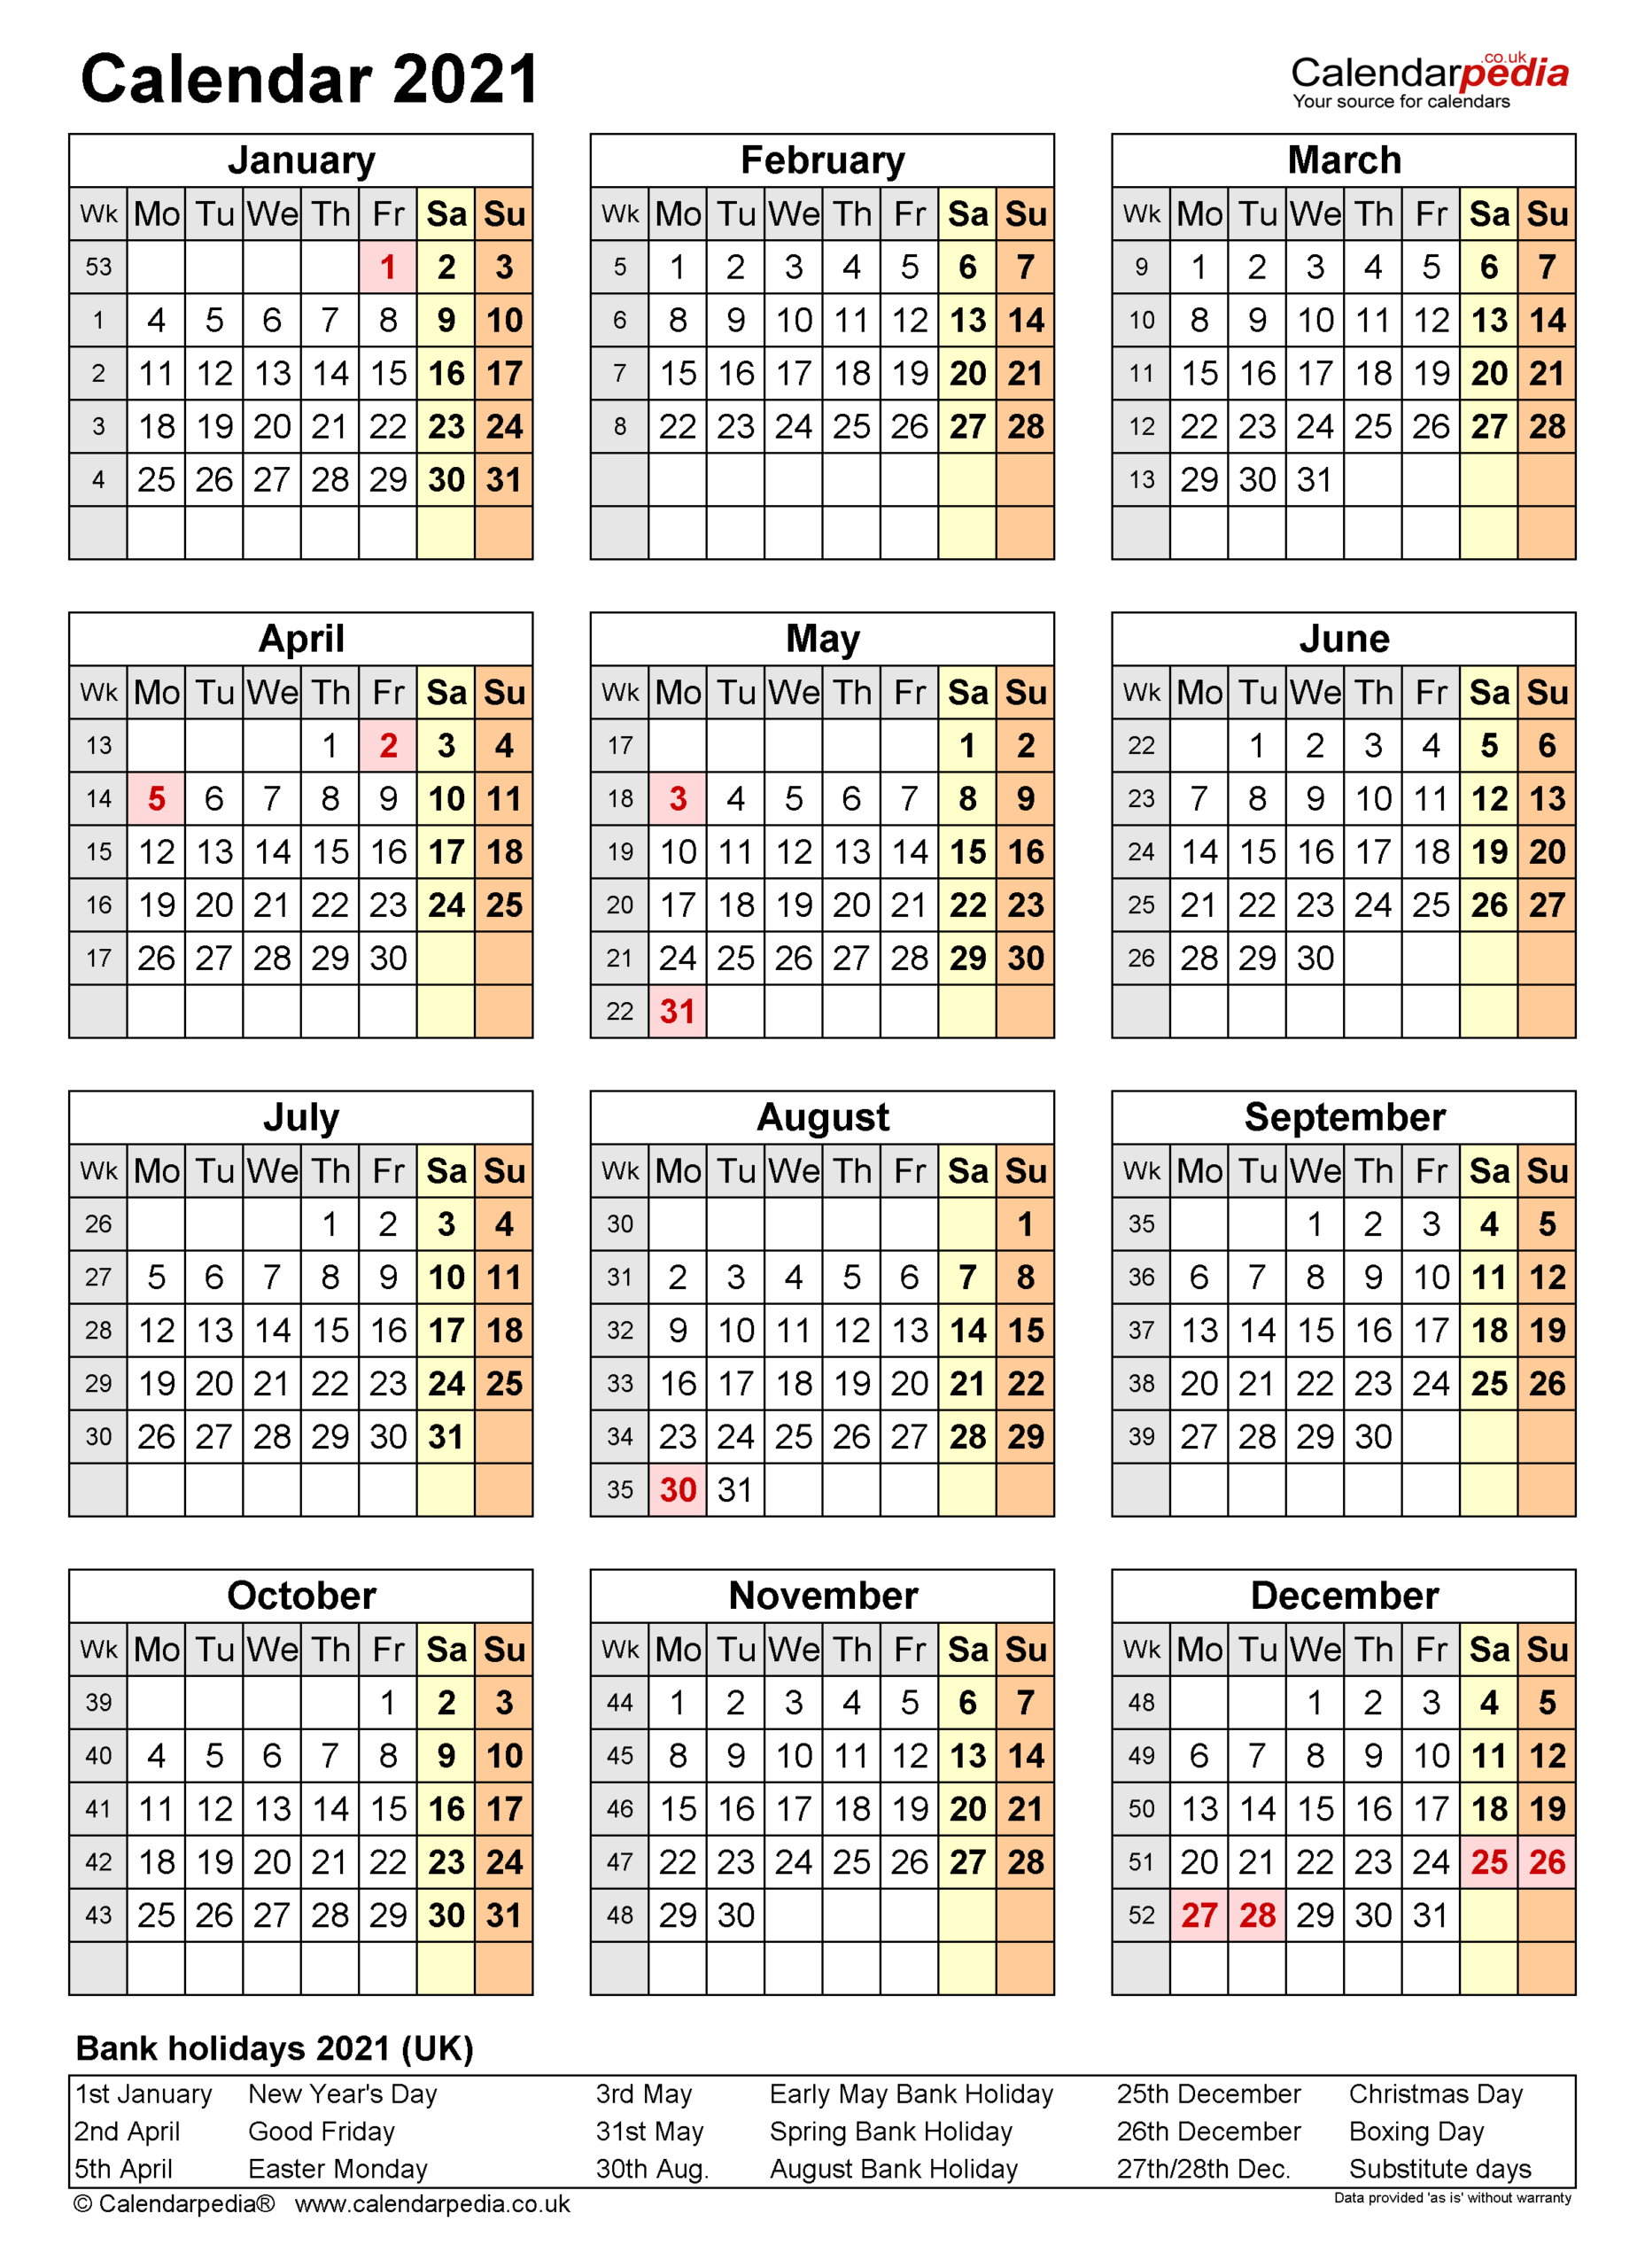 Calendar 2021 (Uk) - Free Printable Microsoft Word Templates inside Sunday To Saturday Year Calendar 2021/21